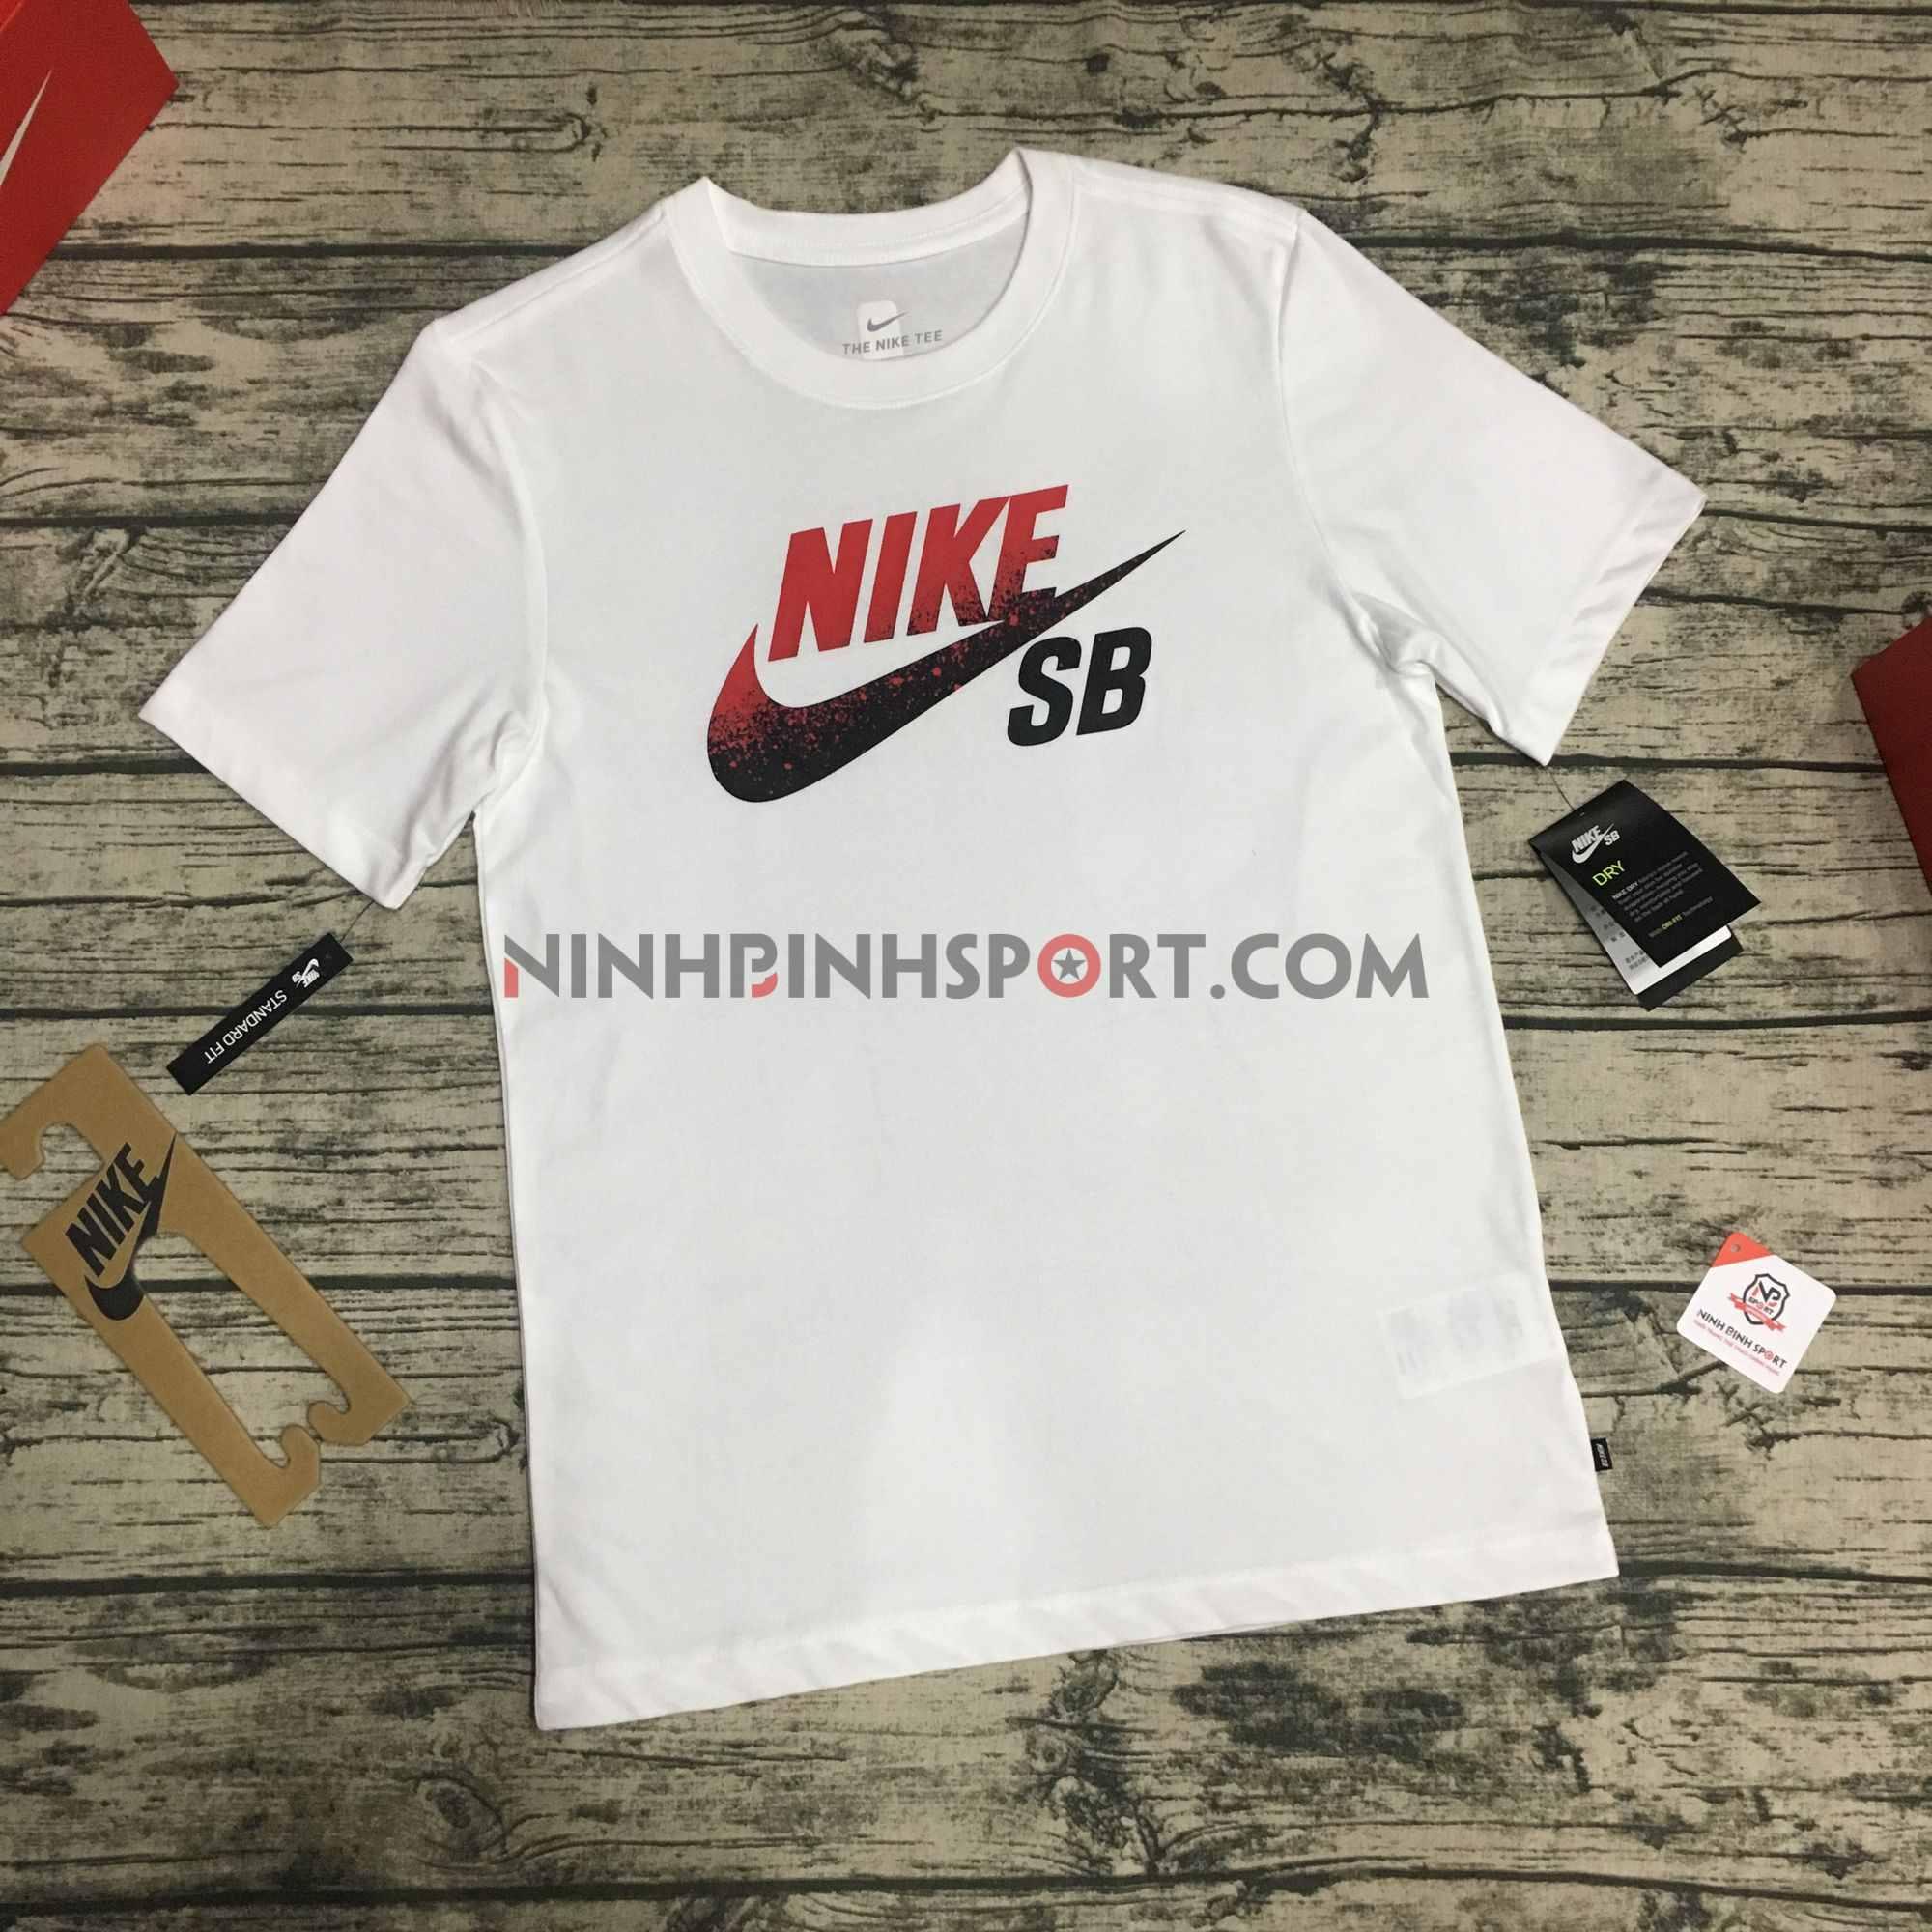 Áo thể thao nam Nike SB Dri-FIT Logo Skate White BV7434-101